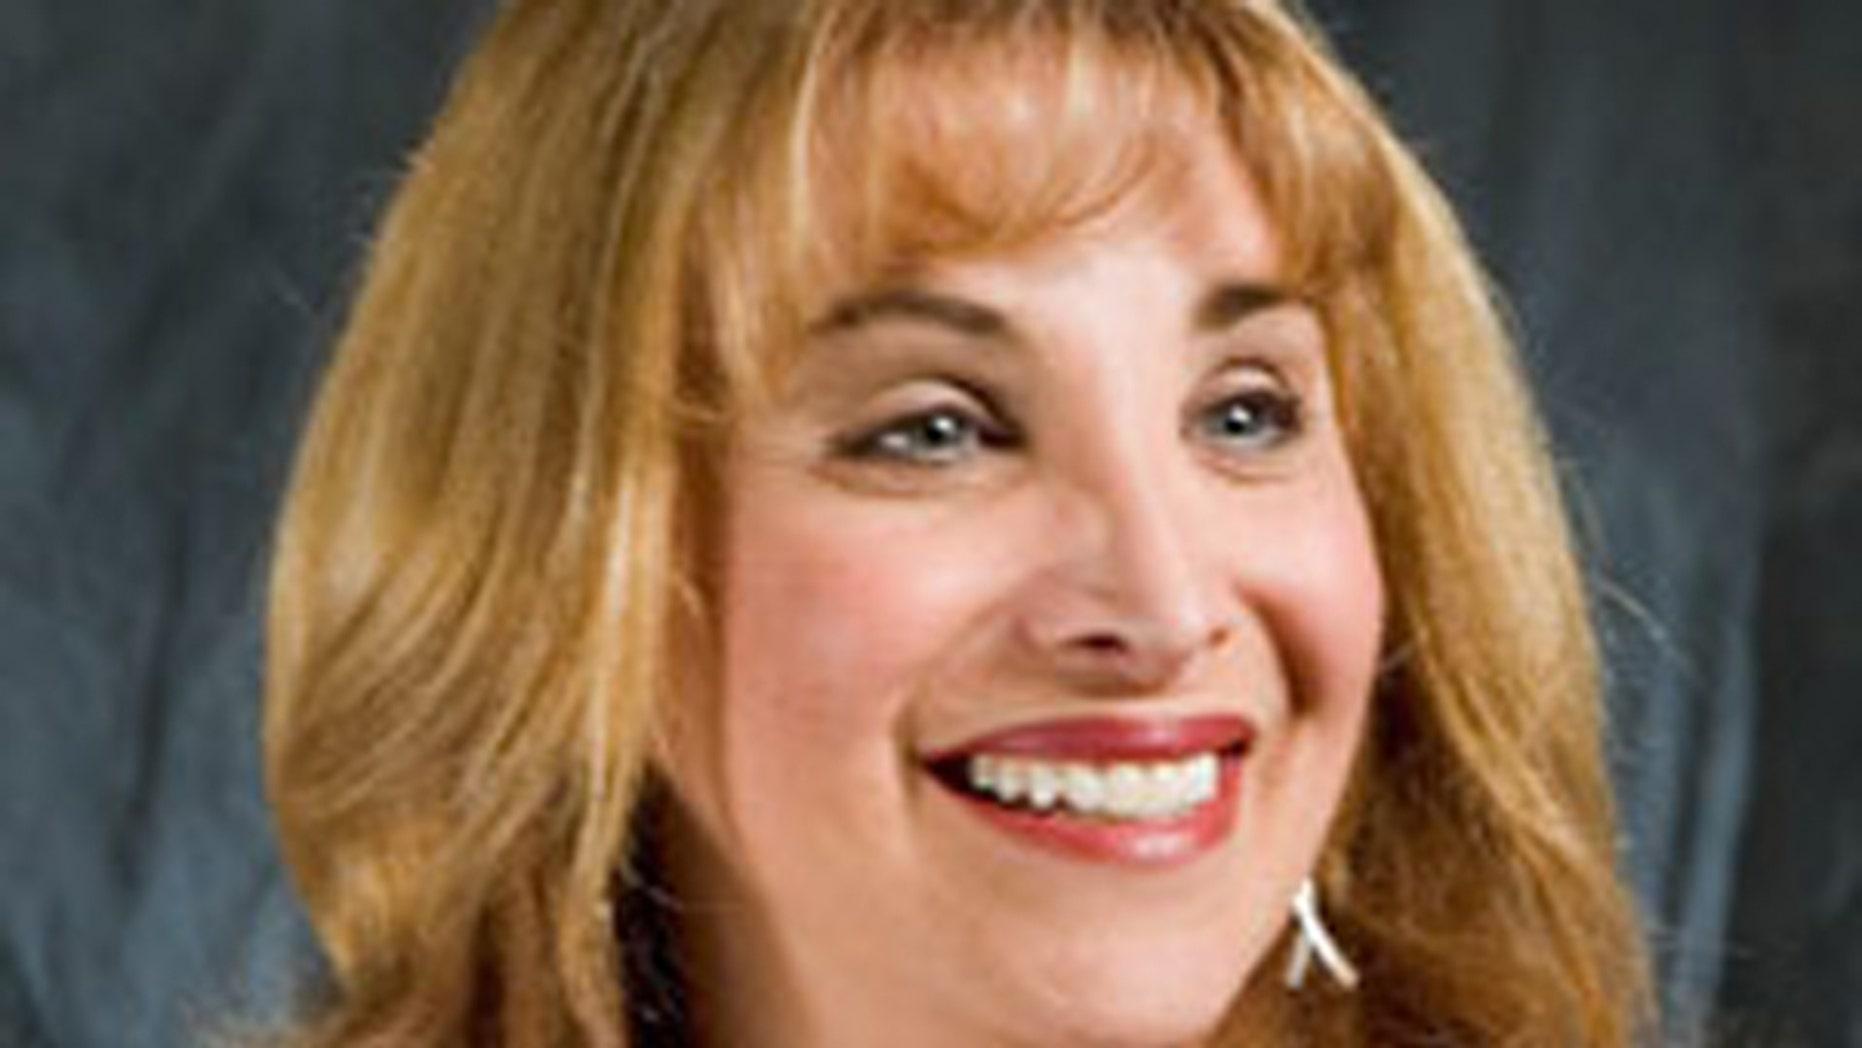 Amanda Simpson, shown here, joined the Commerce Department Jan. 5. (MyFoxPhoenix)